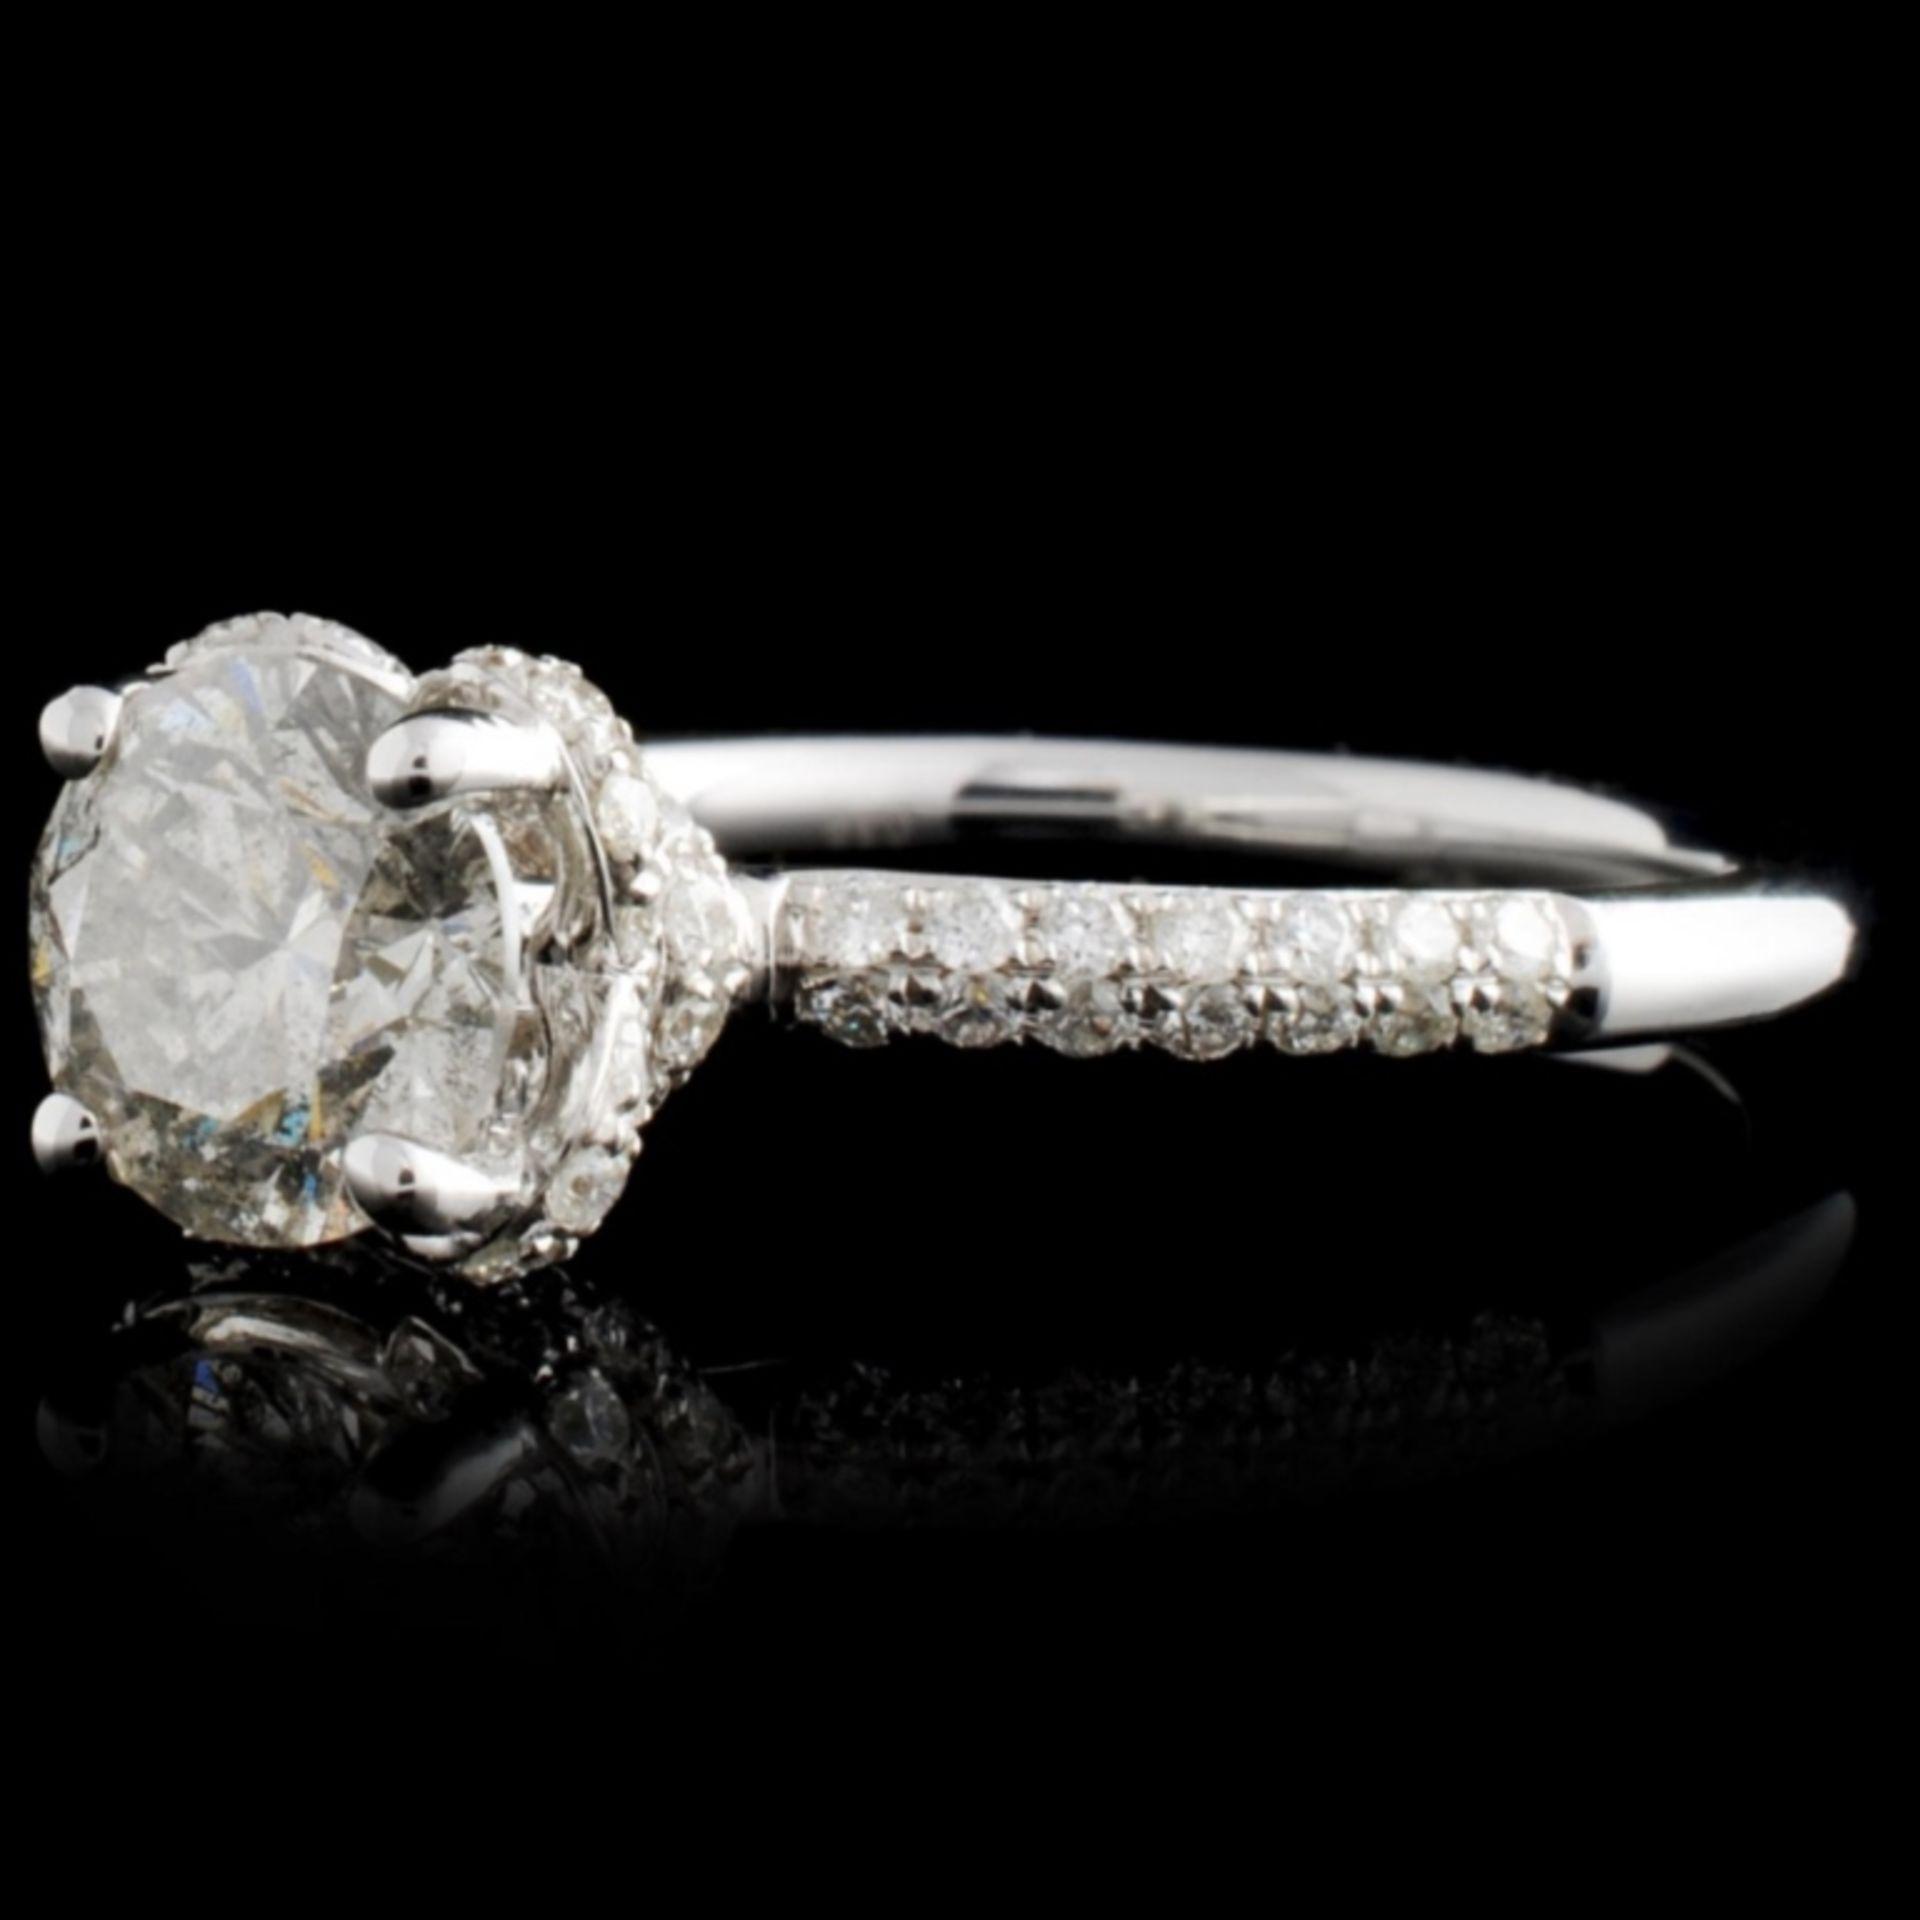 18K White Gold 1.58ctw Diamond Ring - Image 2 of 4